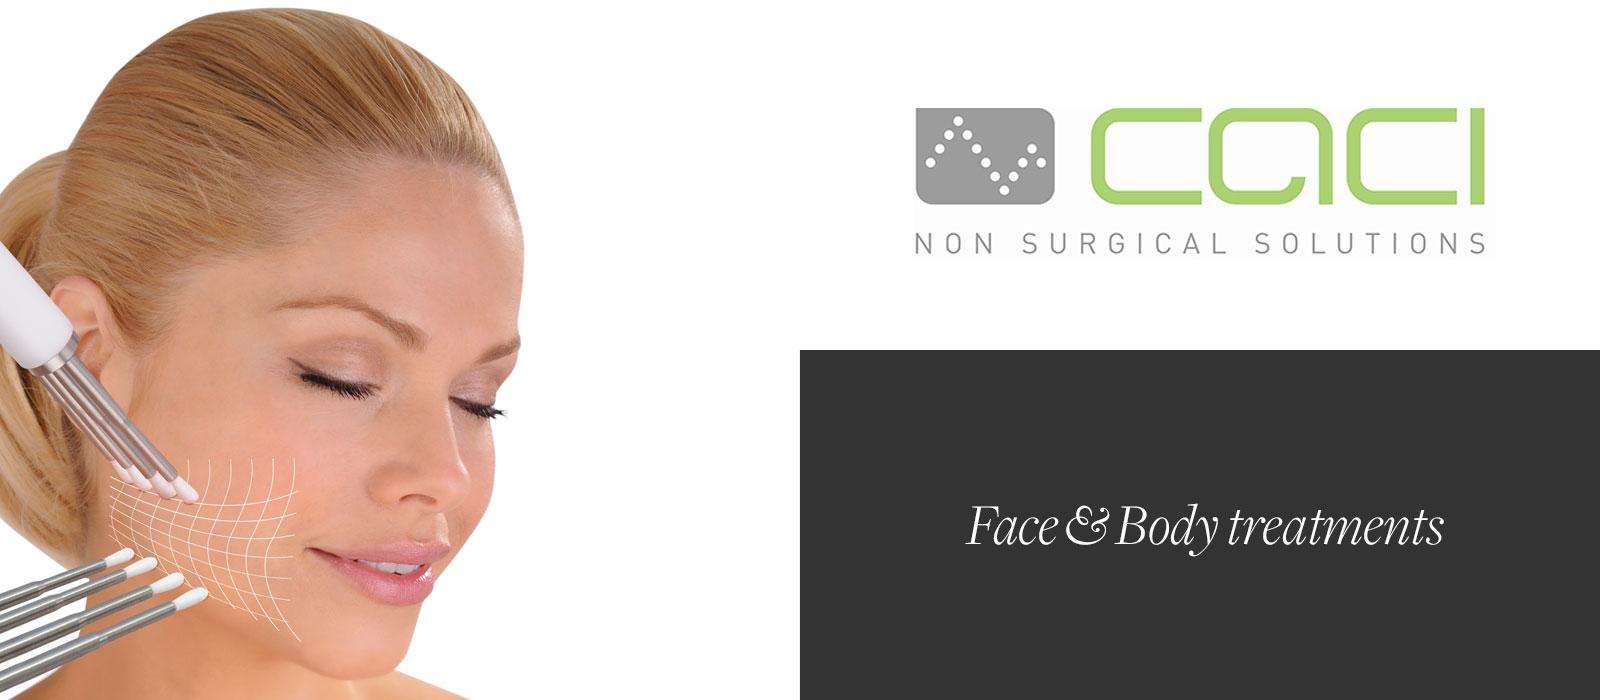 Caci Facial Treatments